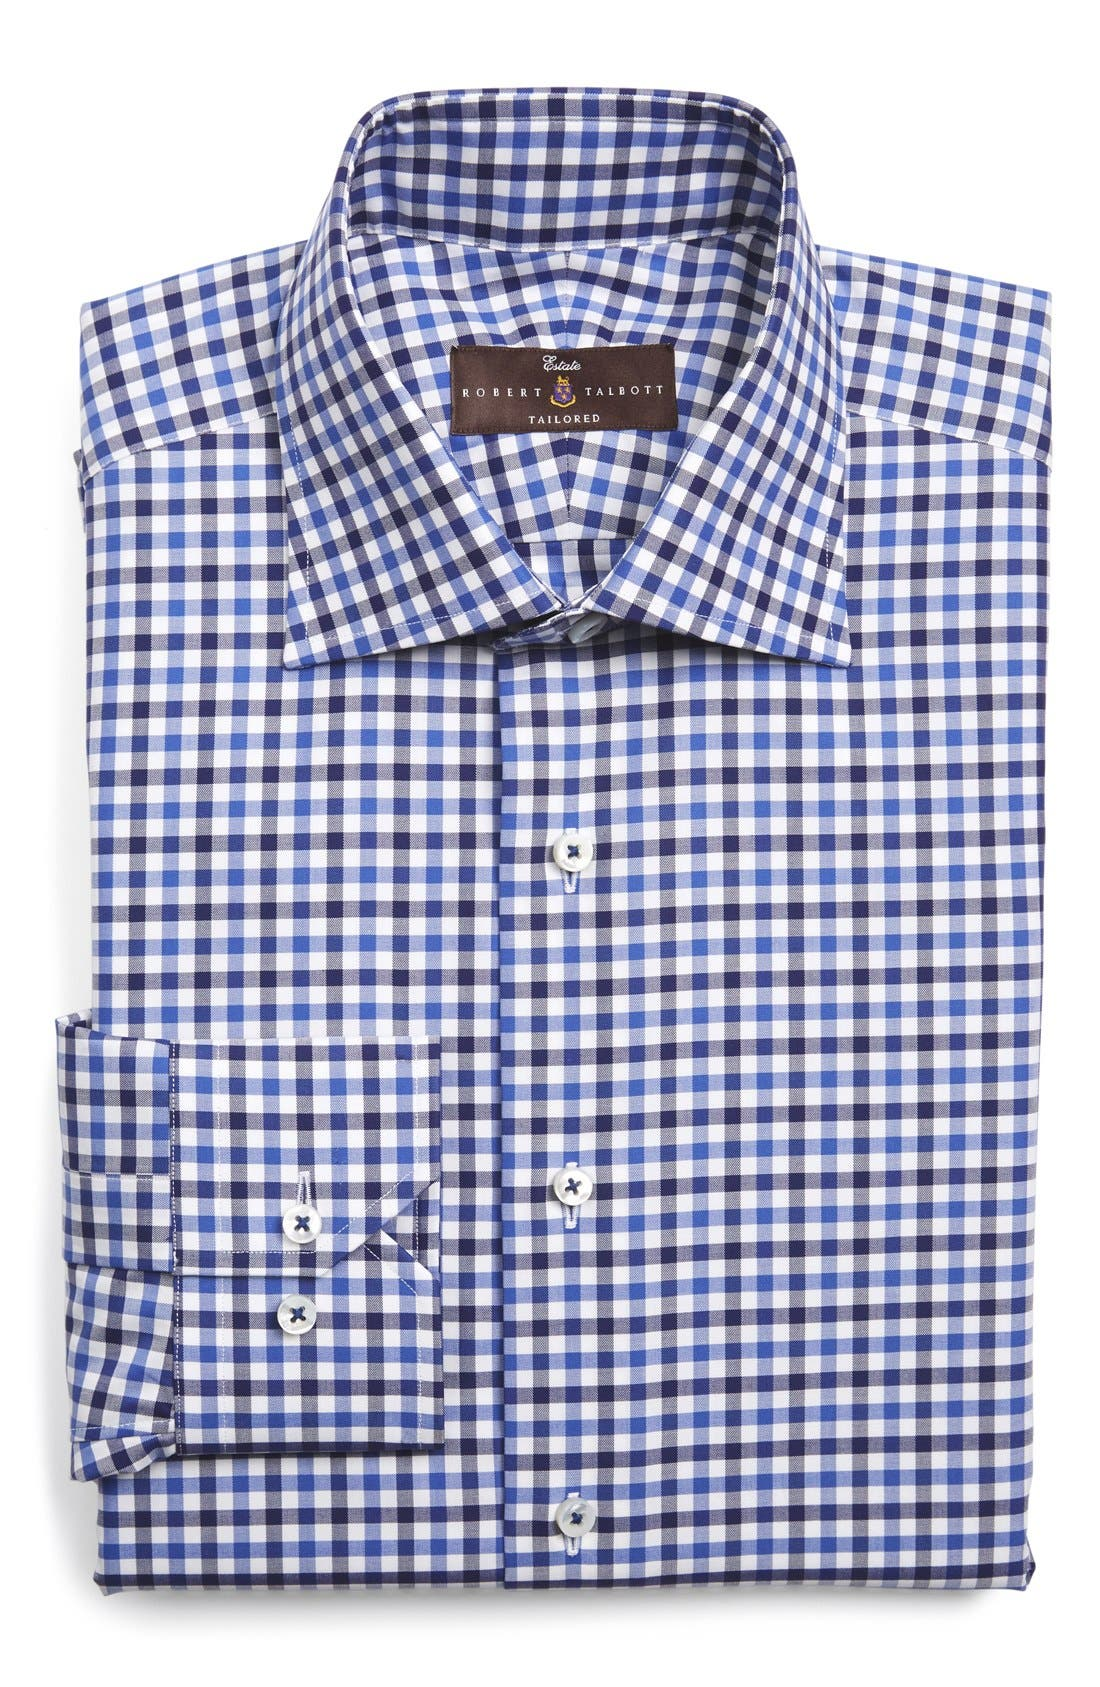 Main Image - Robert Talbott Tailored Fit Check Dress Shirt